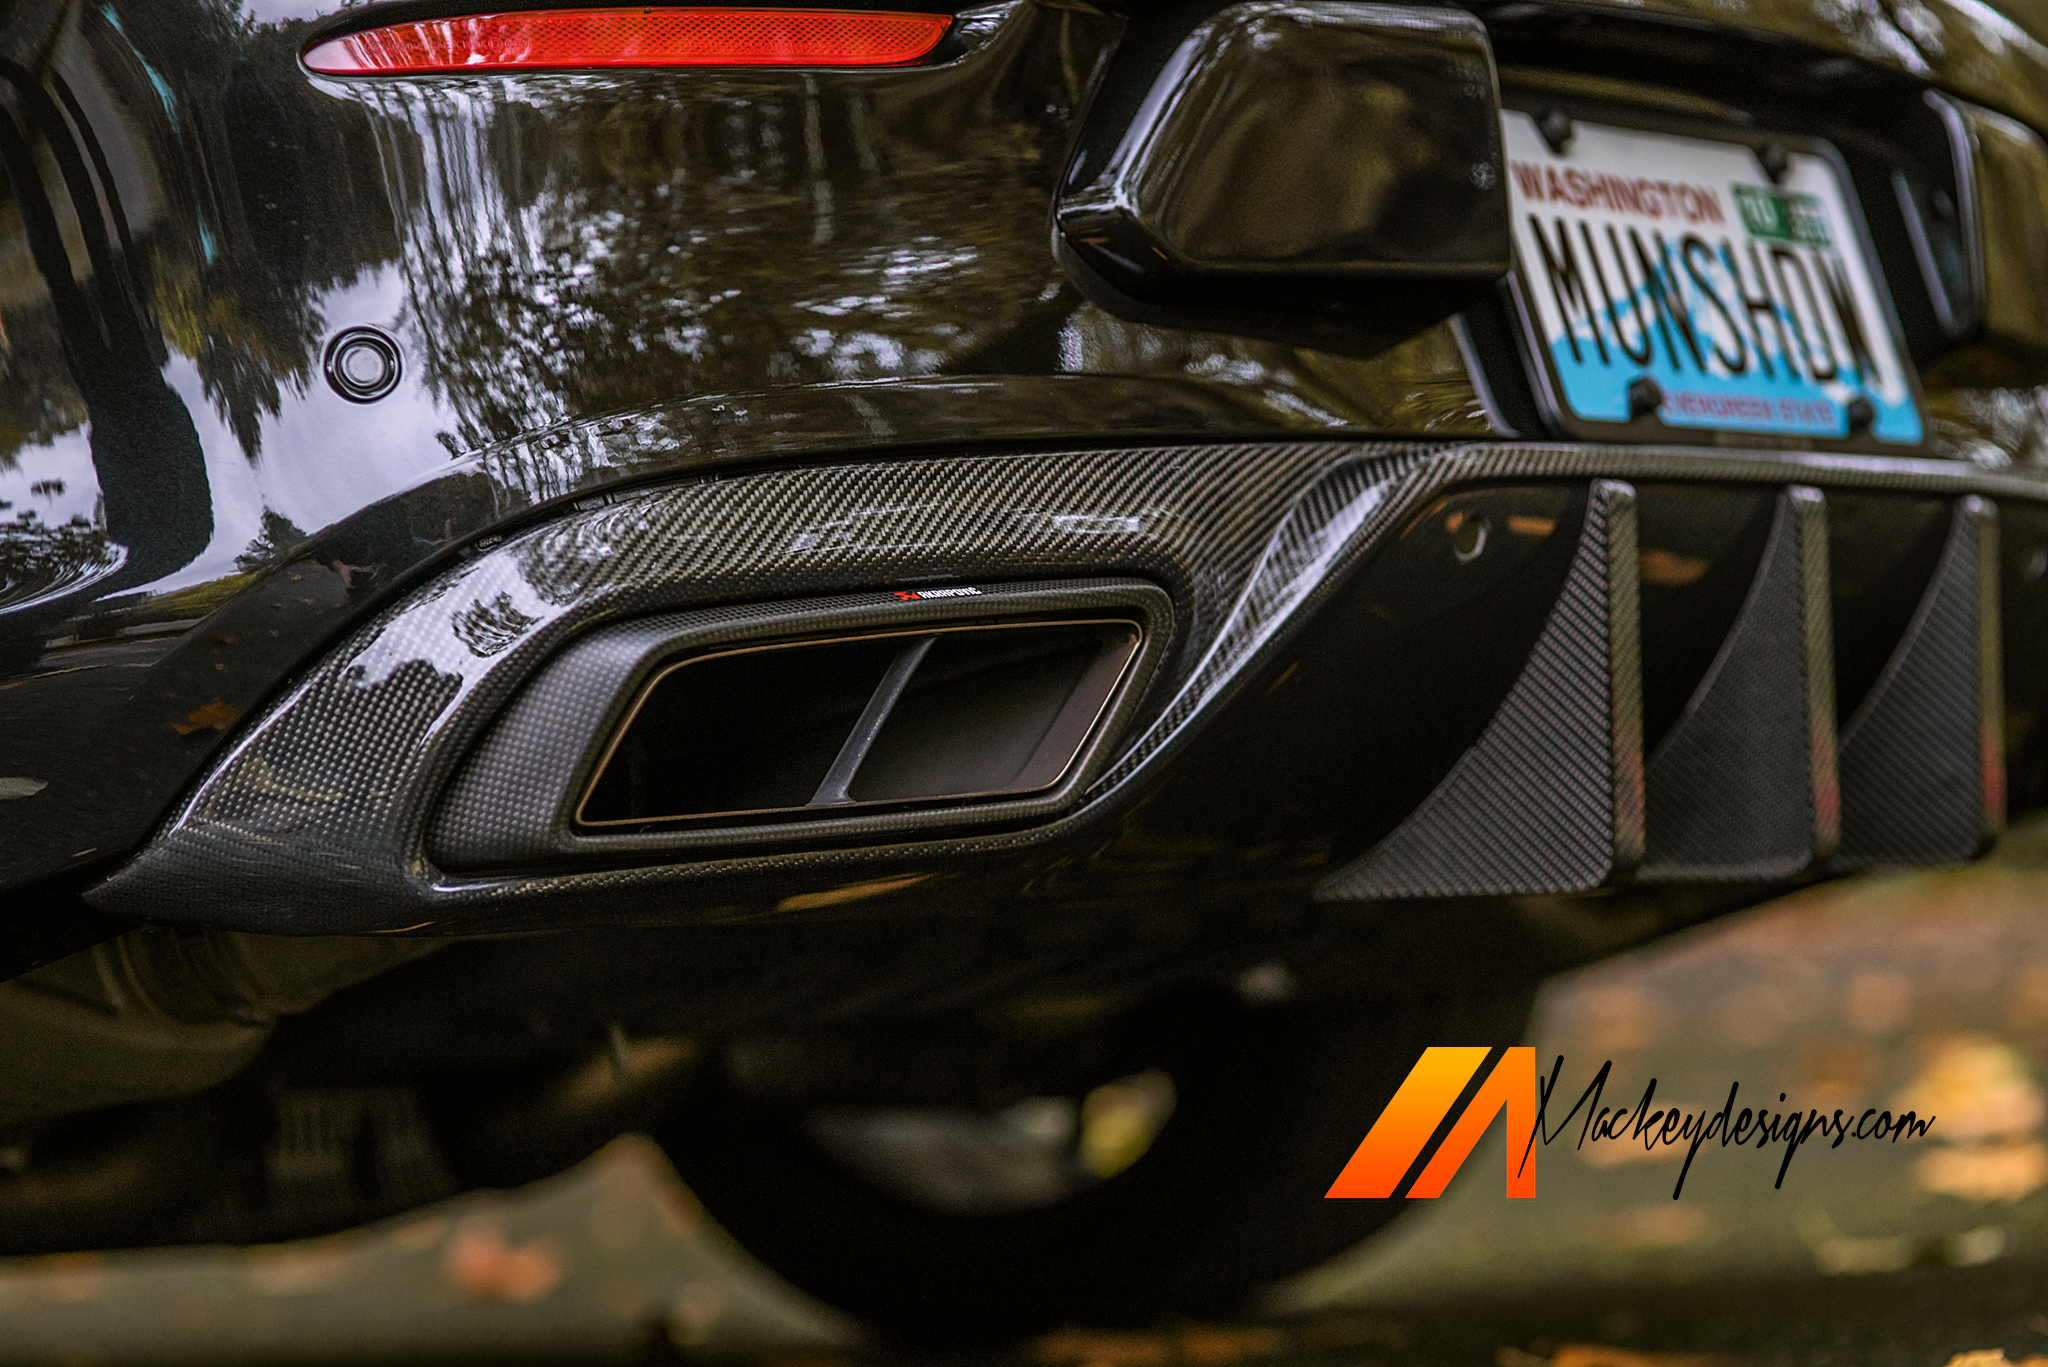 Mackeydesigns_Mercedes_C63S-4.jpg